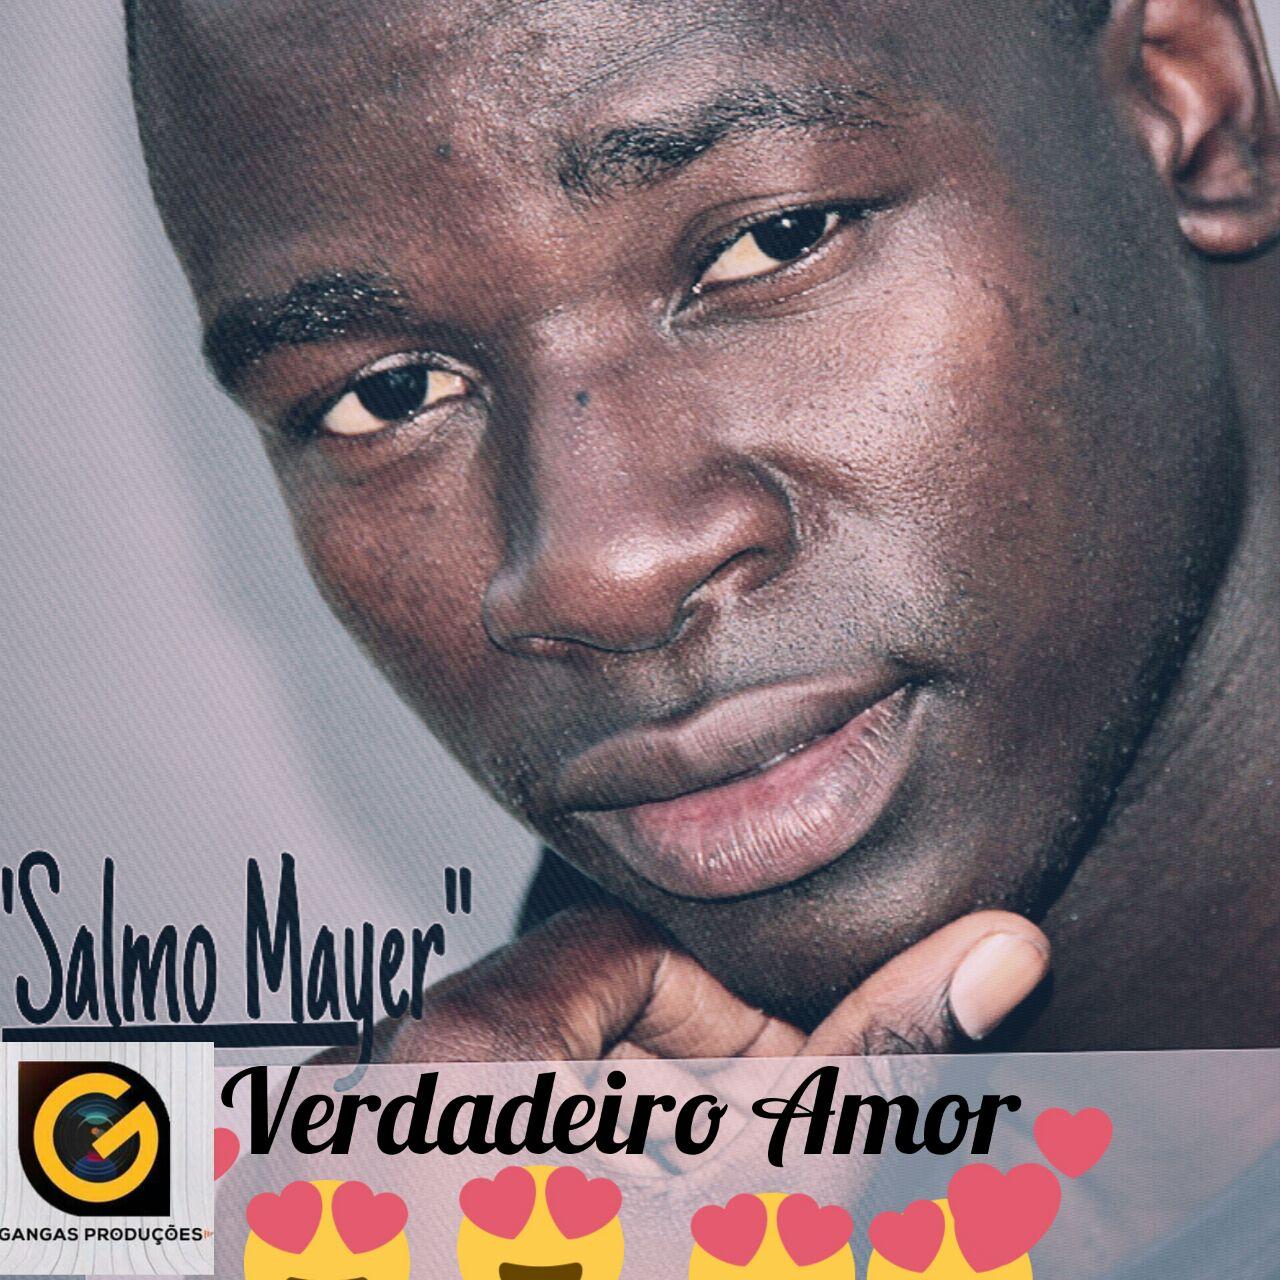 Baixar Mp3 Salmo Mayer Verdadeiro Amor 2017 Site De